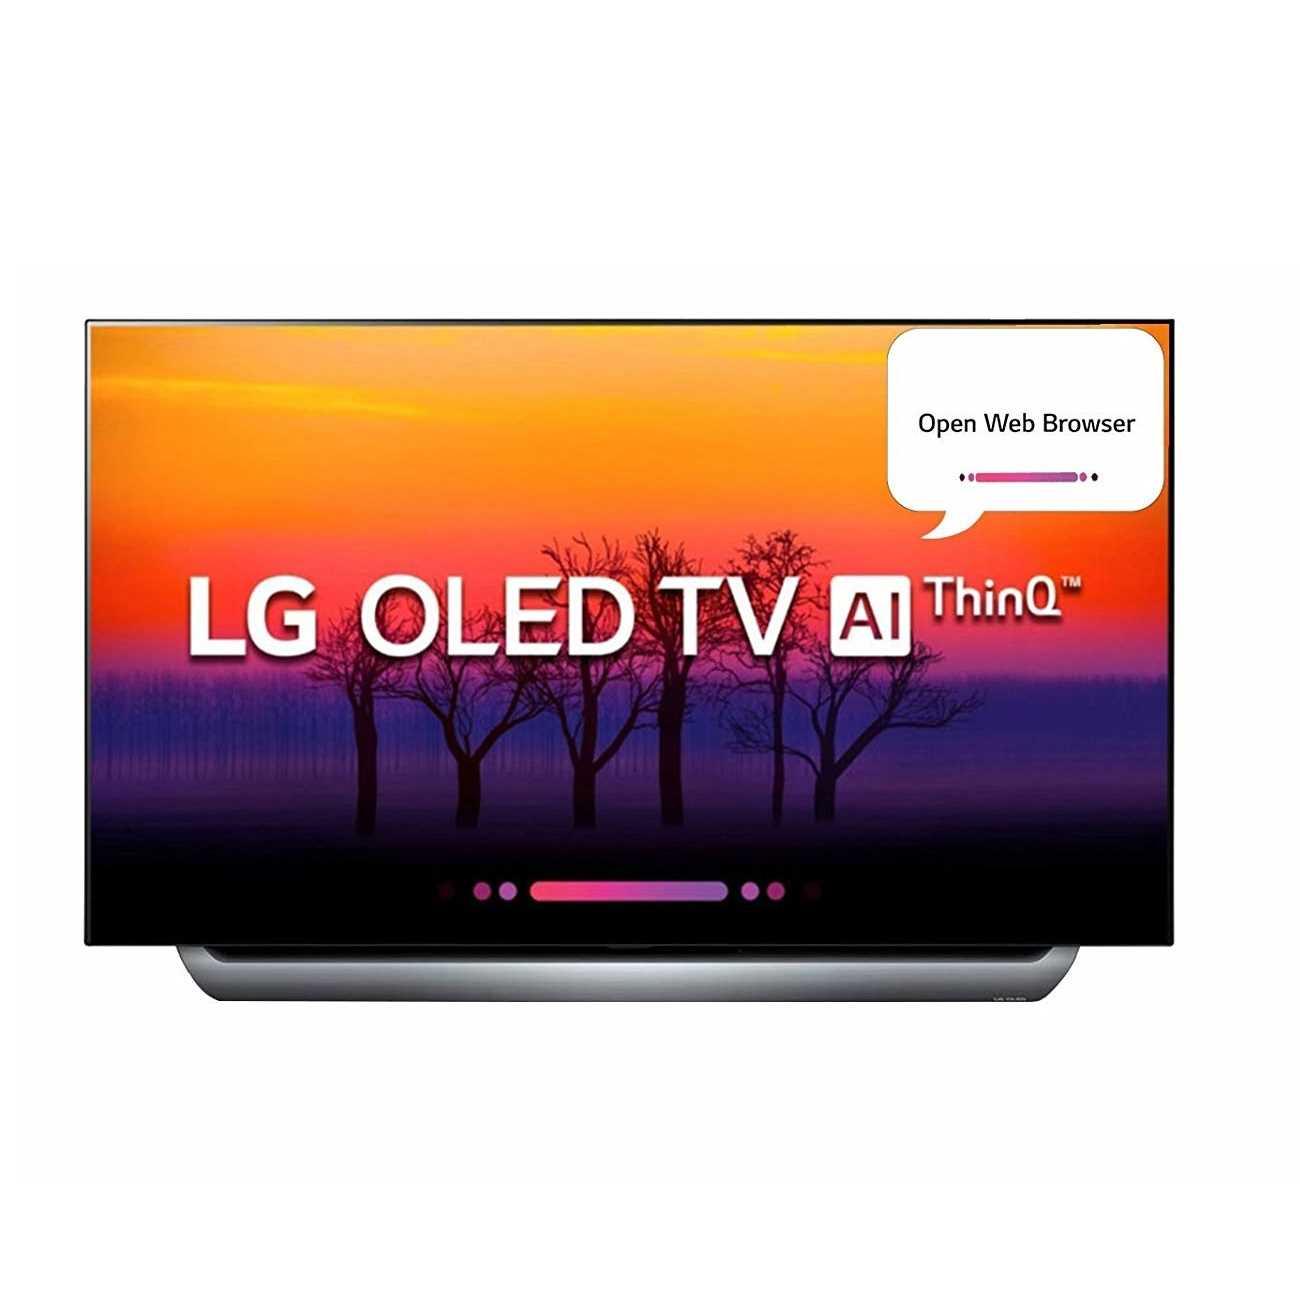 183234ceb8d LG OLED55C8PTA 55 Inch 4K Ultra HD Smart OLED Television Price  3 Jun 2019